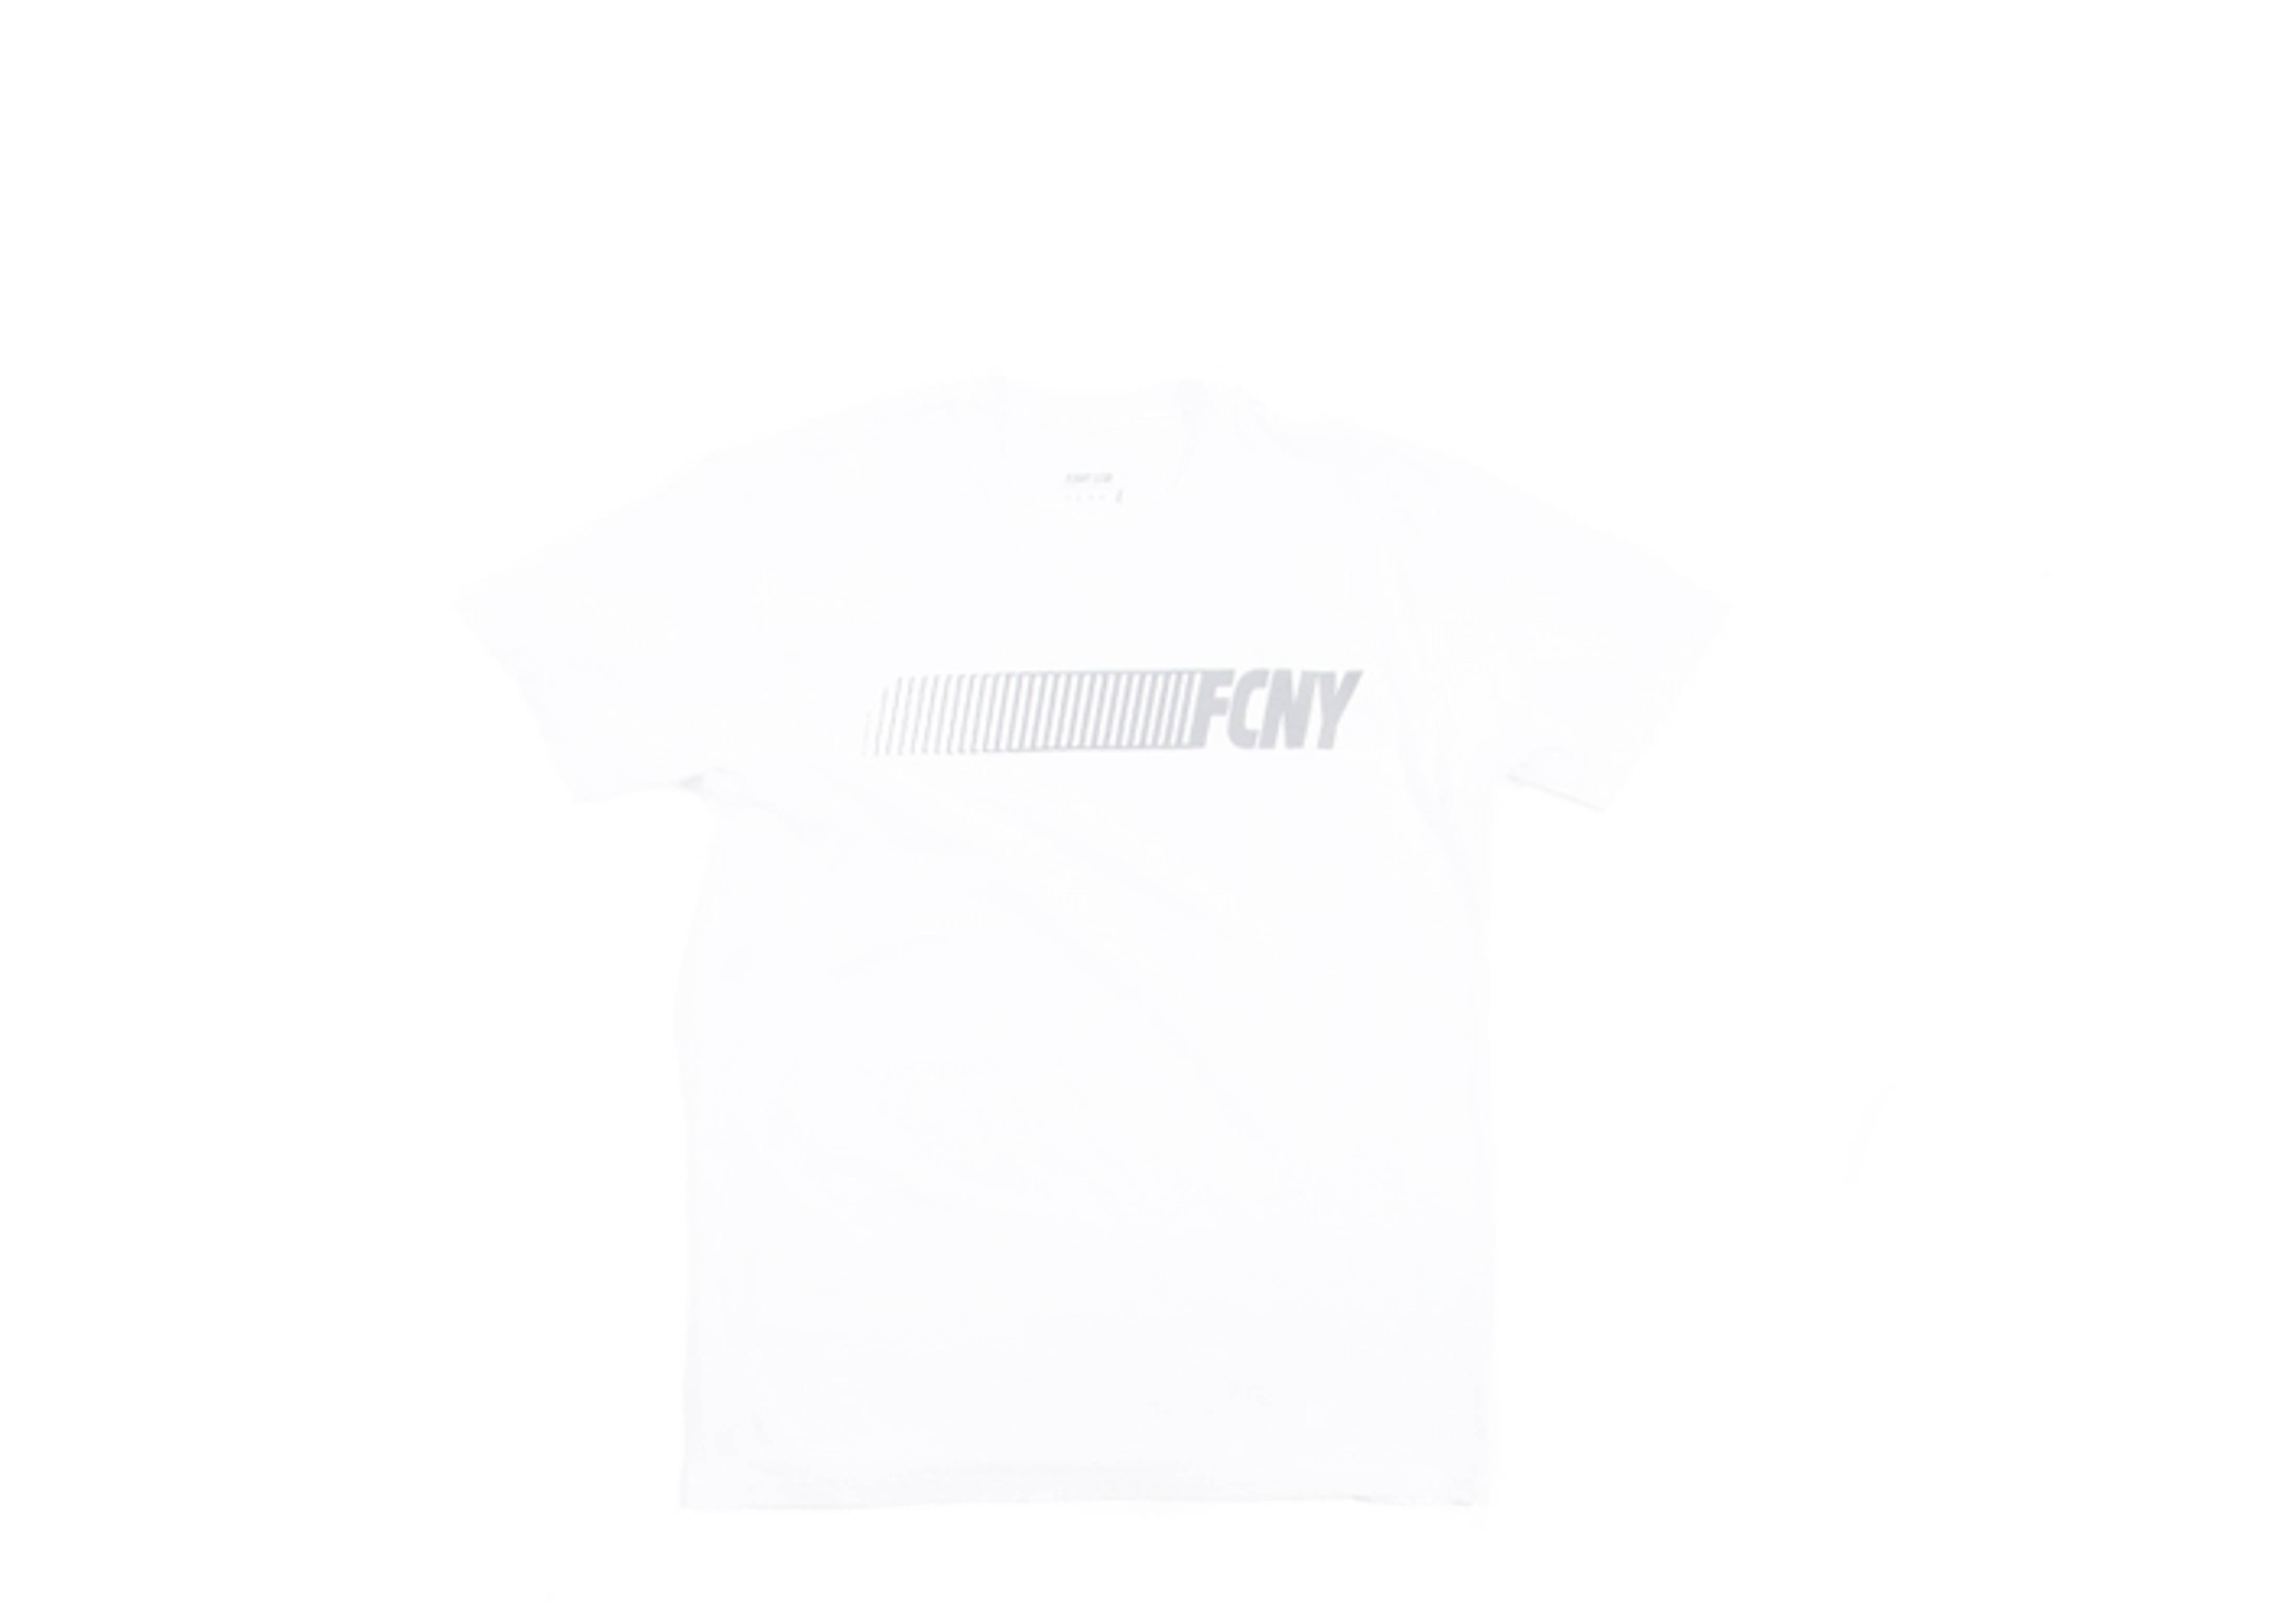 fcny 3m sprint t-shirt